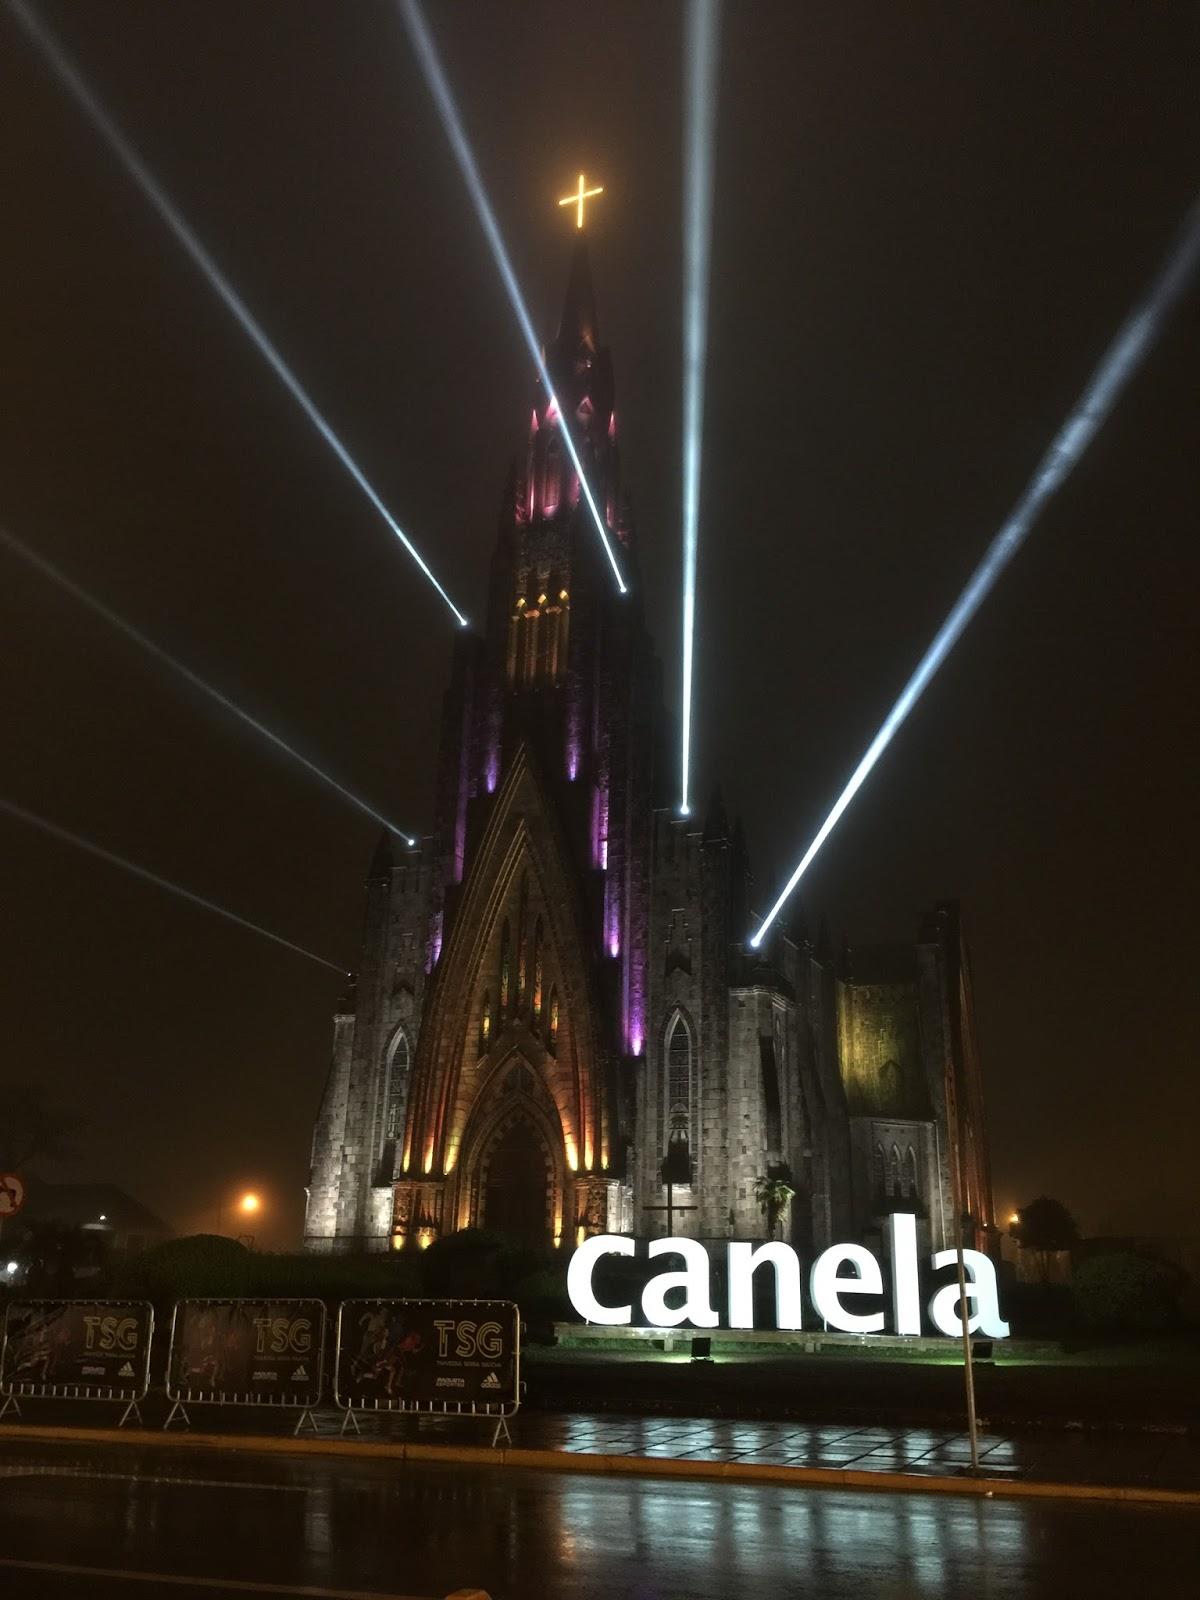 Catedral de Canela iluminada